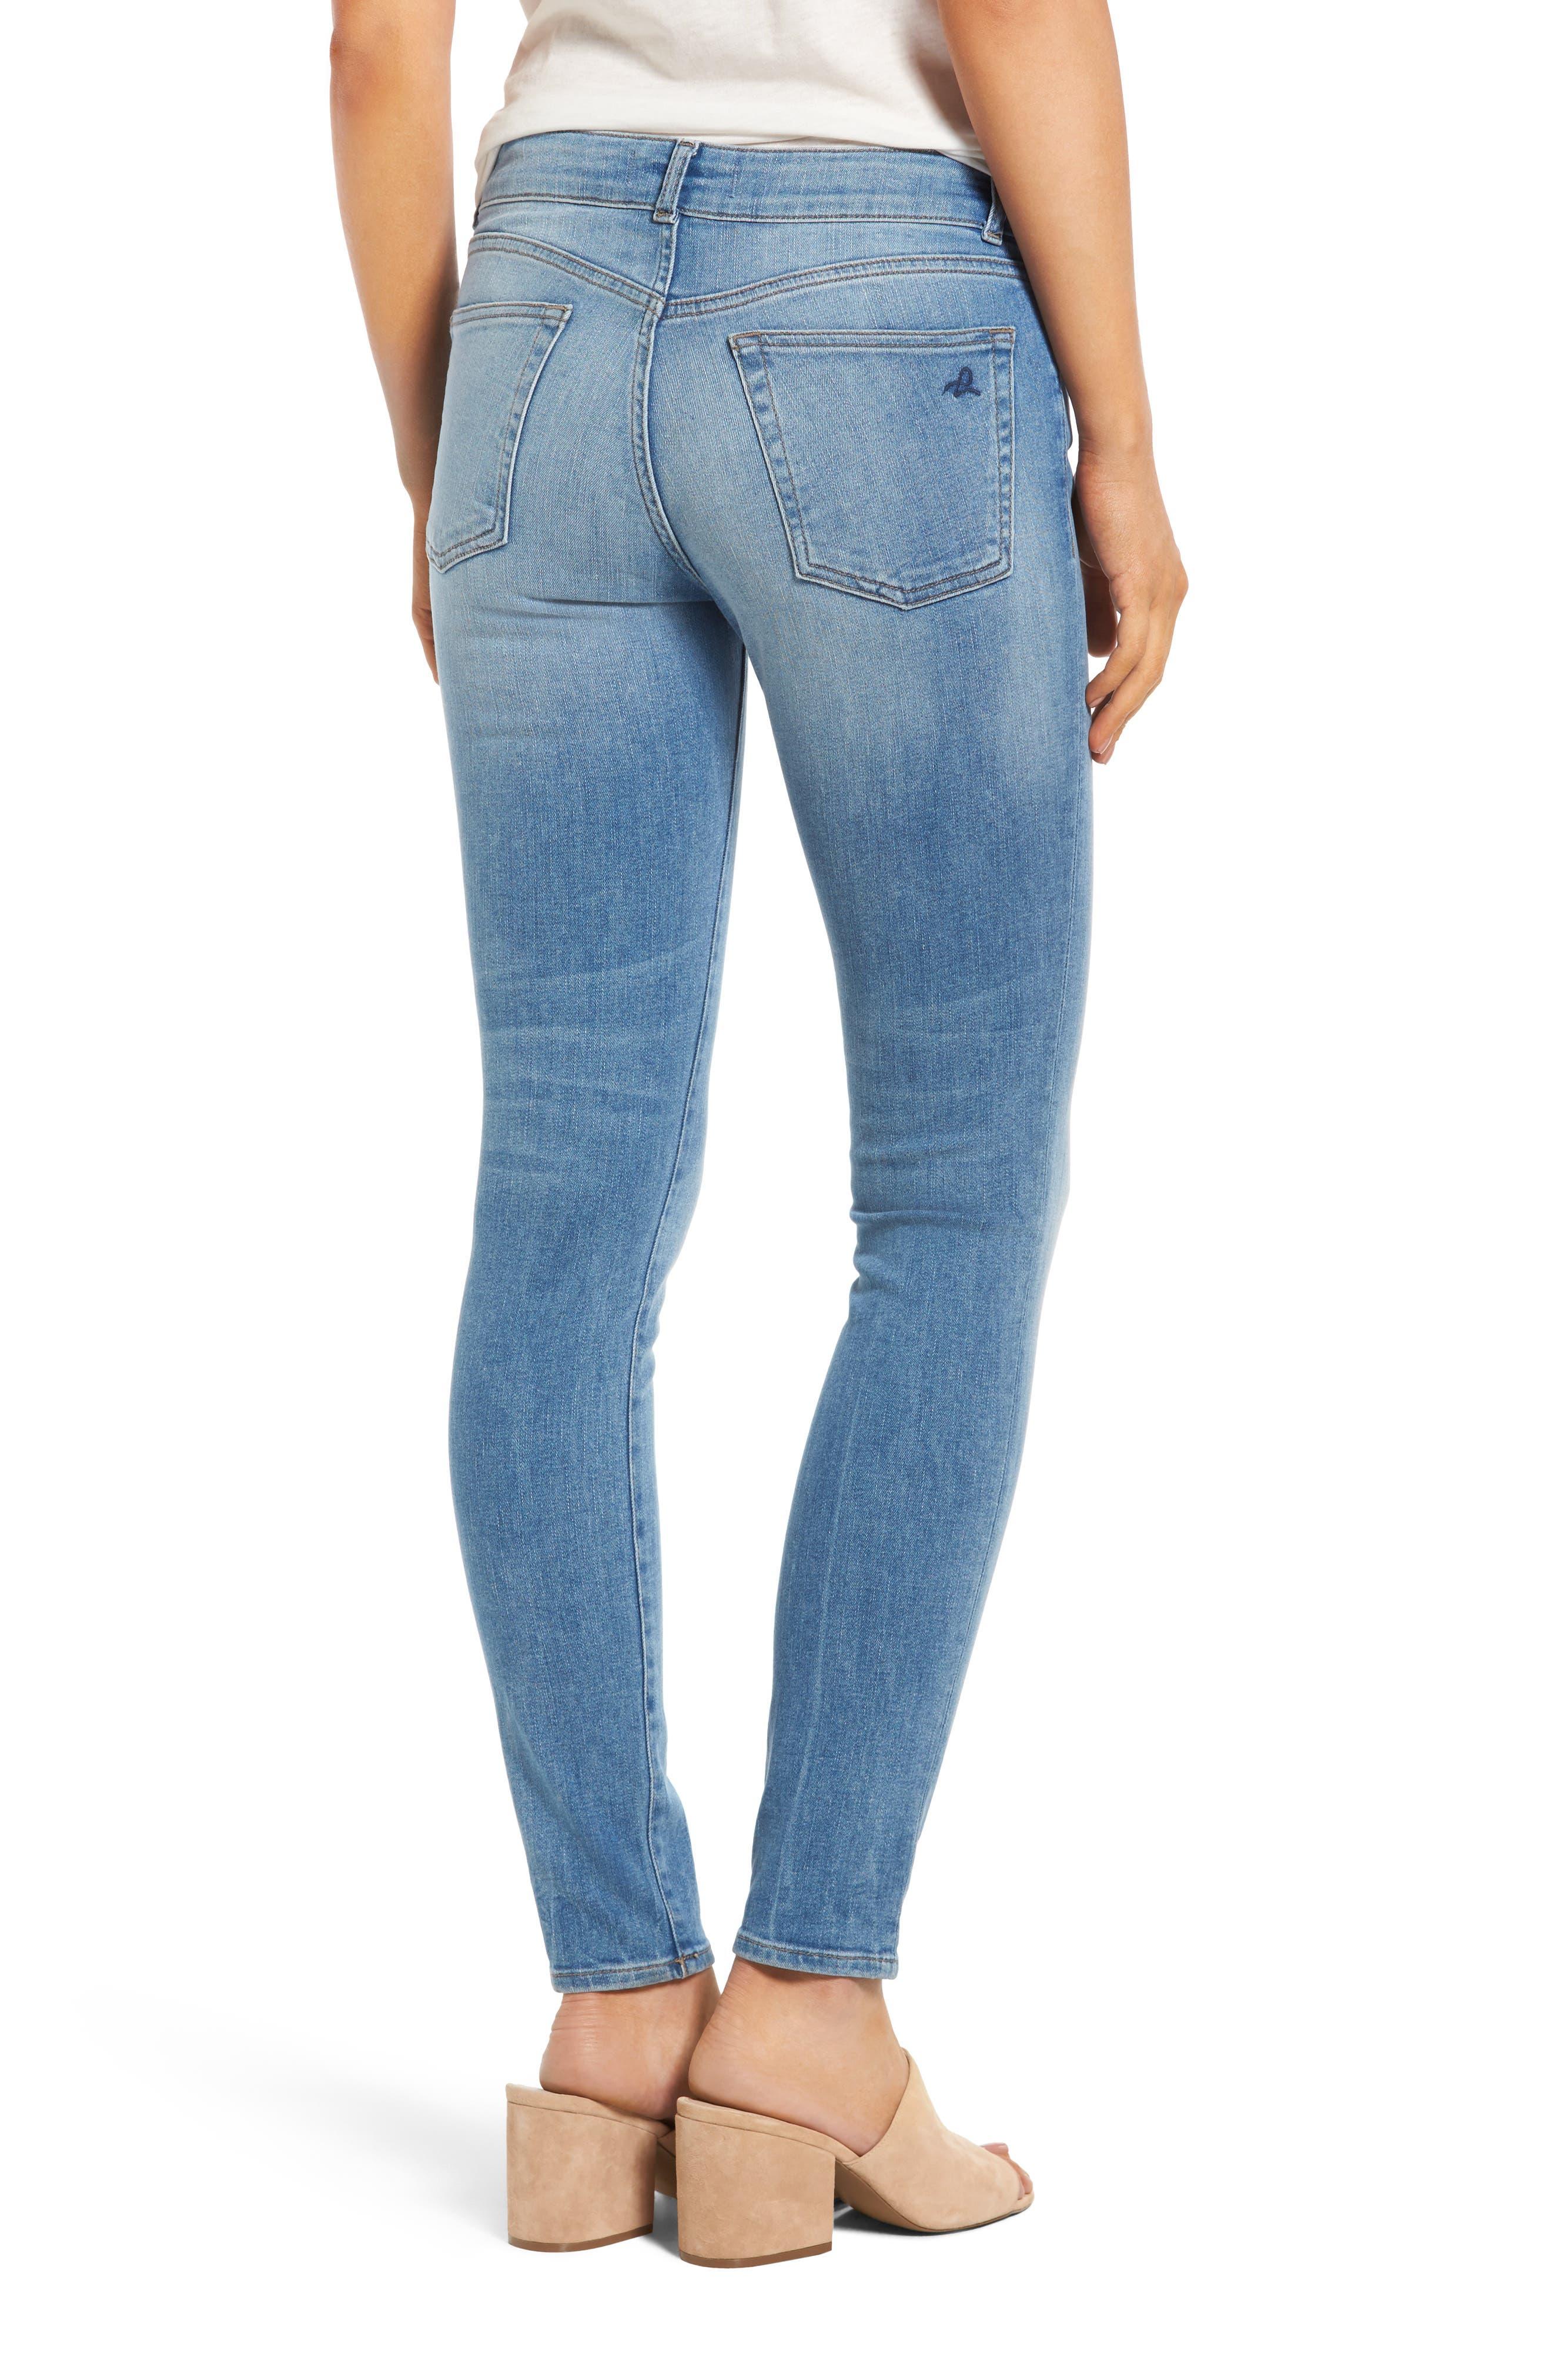 Alternate Image 2  - DL1961 Florence Instasculpt Skinny Jeans (Atwood)